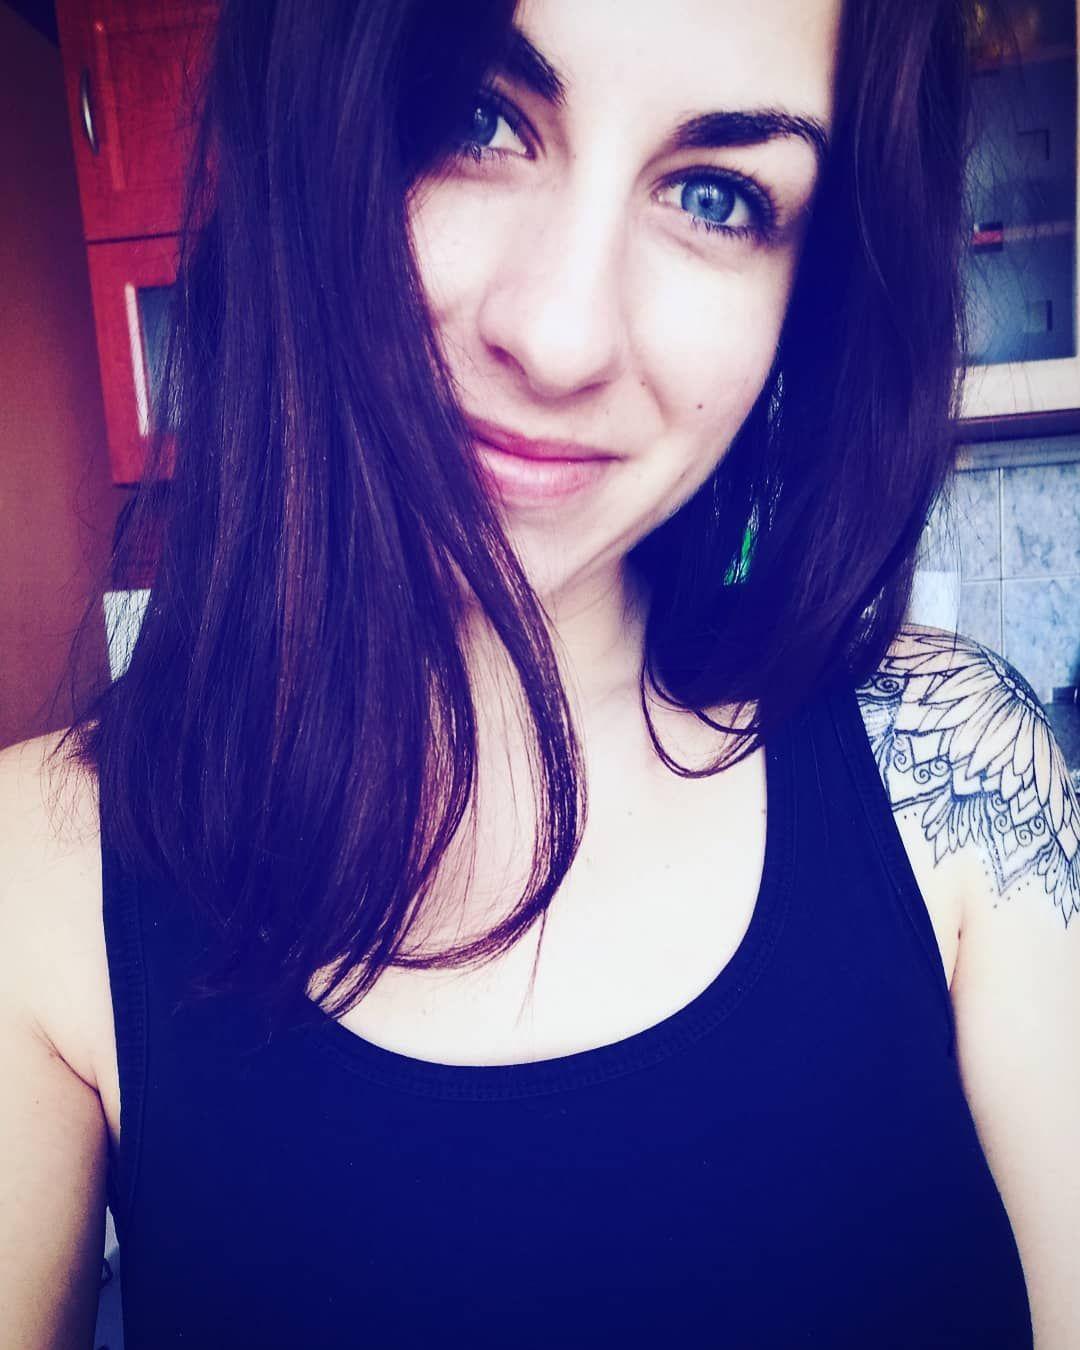 😊😇 . . . . . . . . . . . . . . #Girl#Girlwithtattoo#Smile#Blueeyesgirl#Blueeyes#Instagirl#Instaselfie#Mood#Instamood#Tattoo#Tattooedgirl#Tattooed#Ink#Inkedgirl#Inked#Lazy#Helloworld#Slovakia#Slovakiagirl#Instatattoo#Sunflower#Sunflowertattoo#Stayhome#